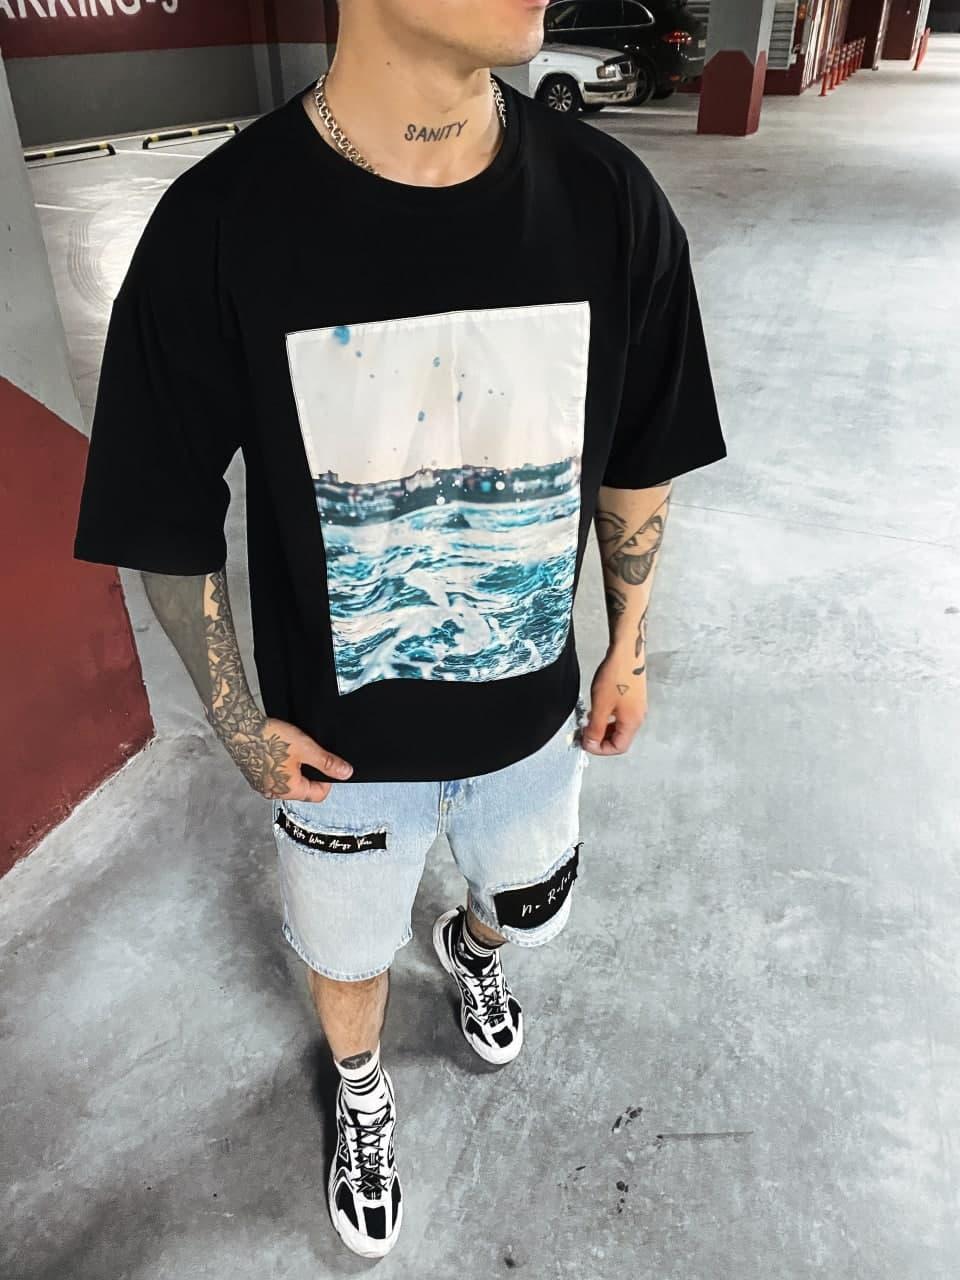 Чоловіча річна чорна футболка oversize. Стильна чоловіча літня футболка.